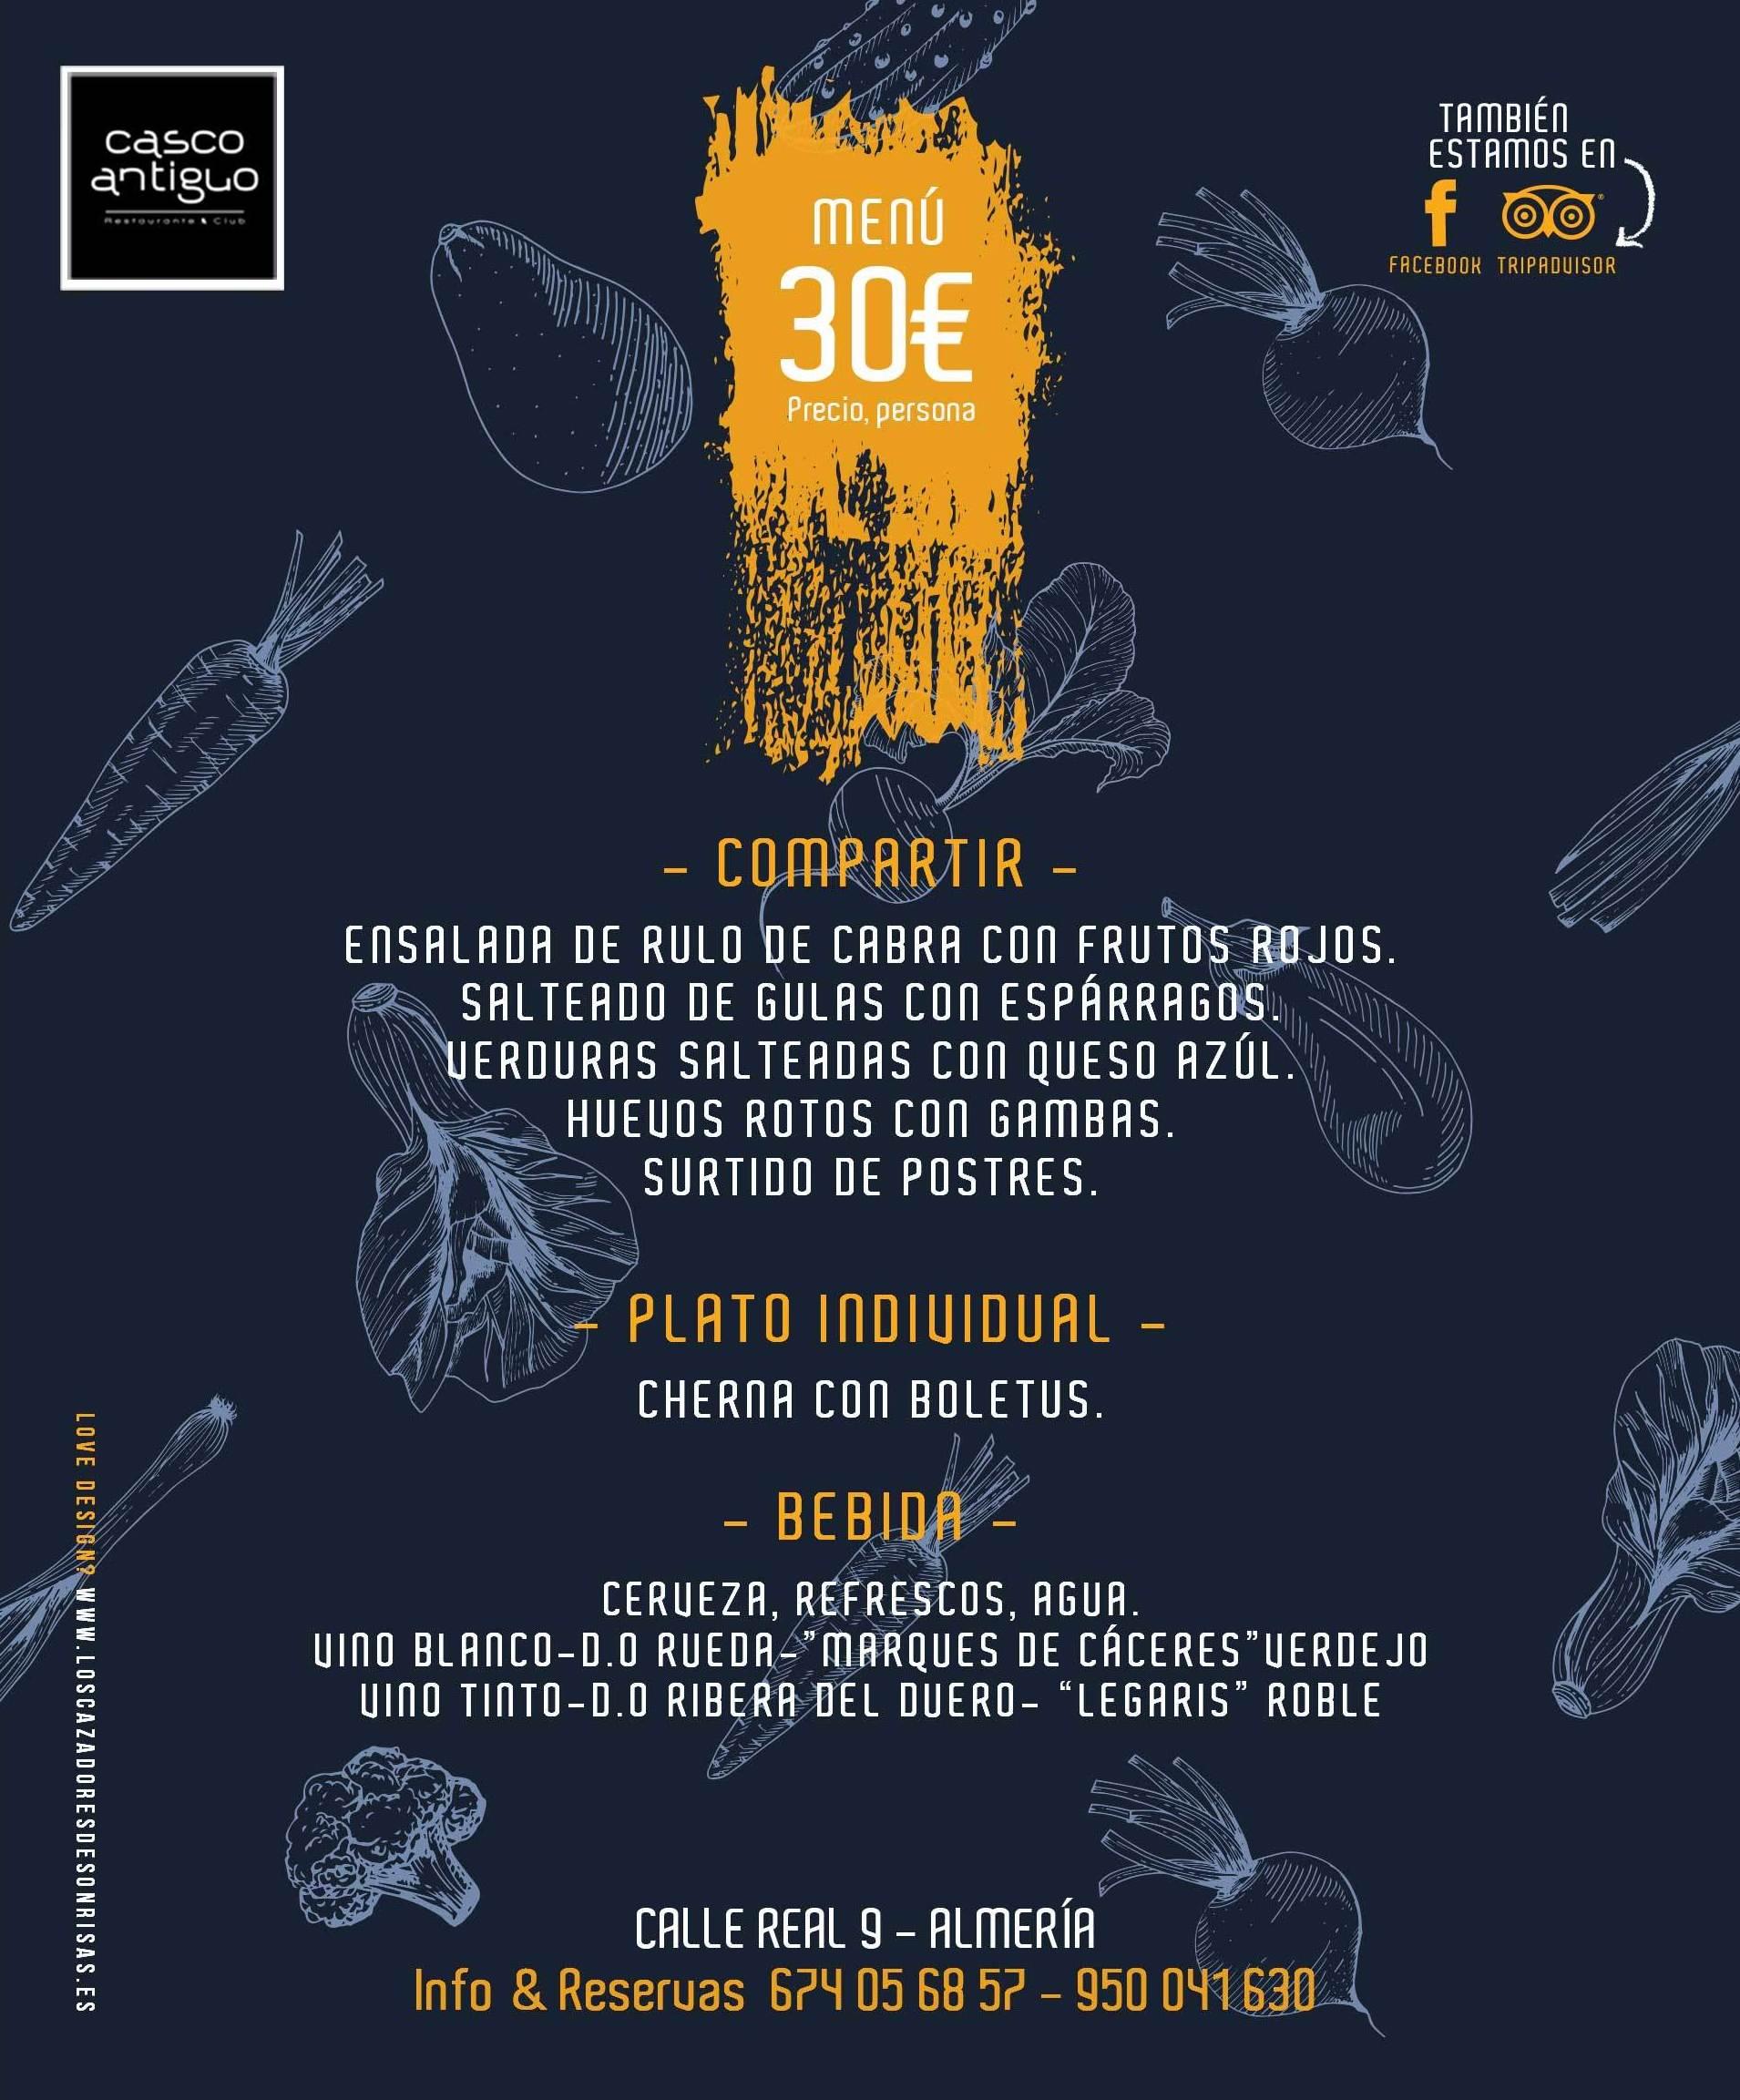 Menu Degustacion 30€